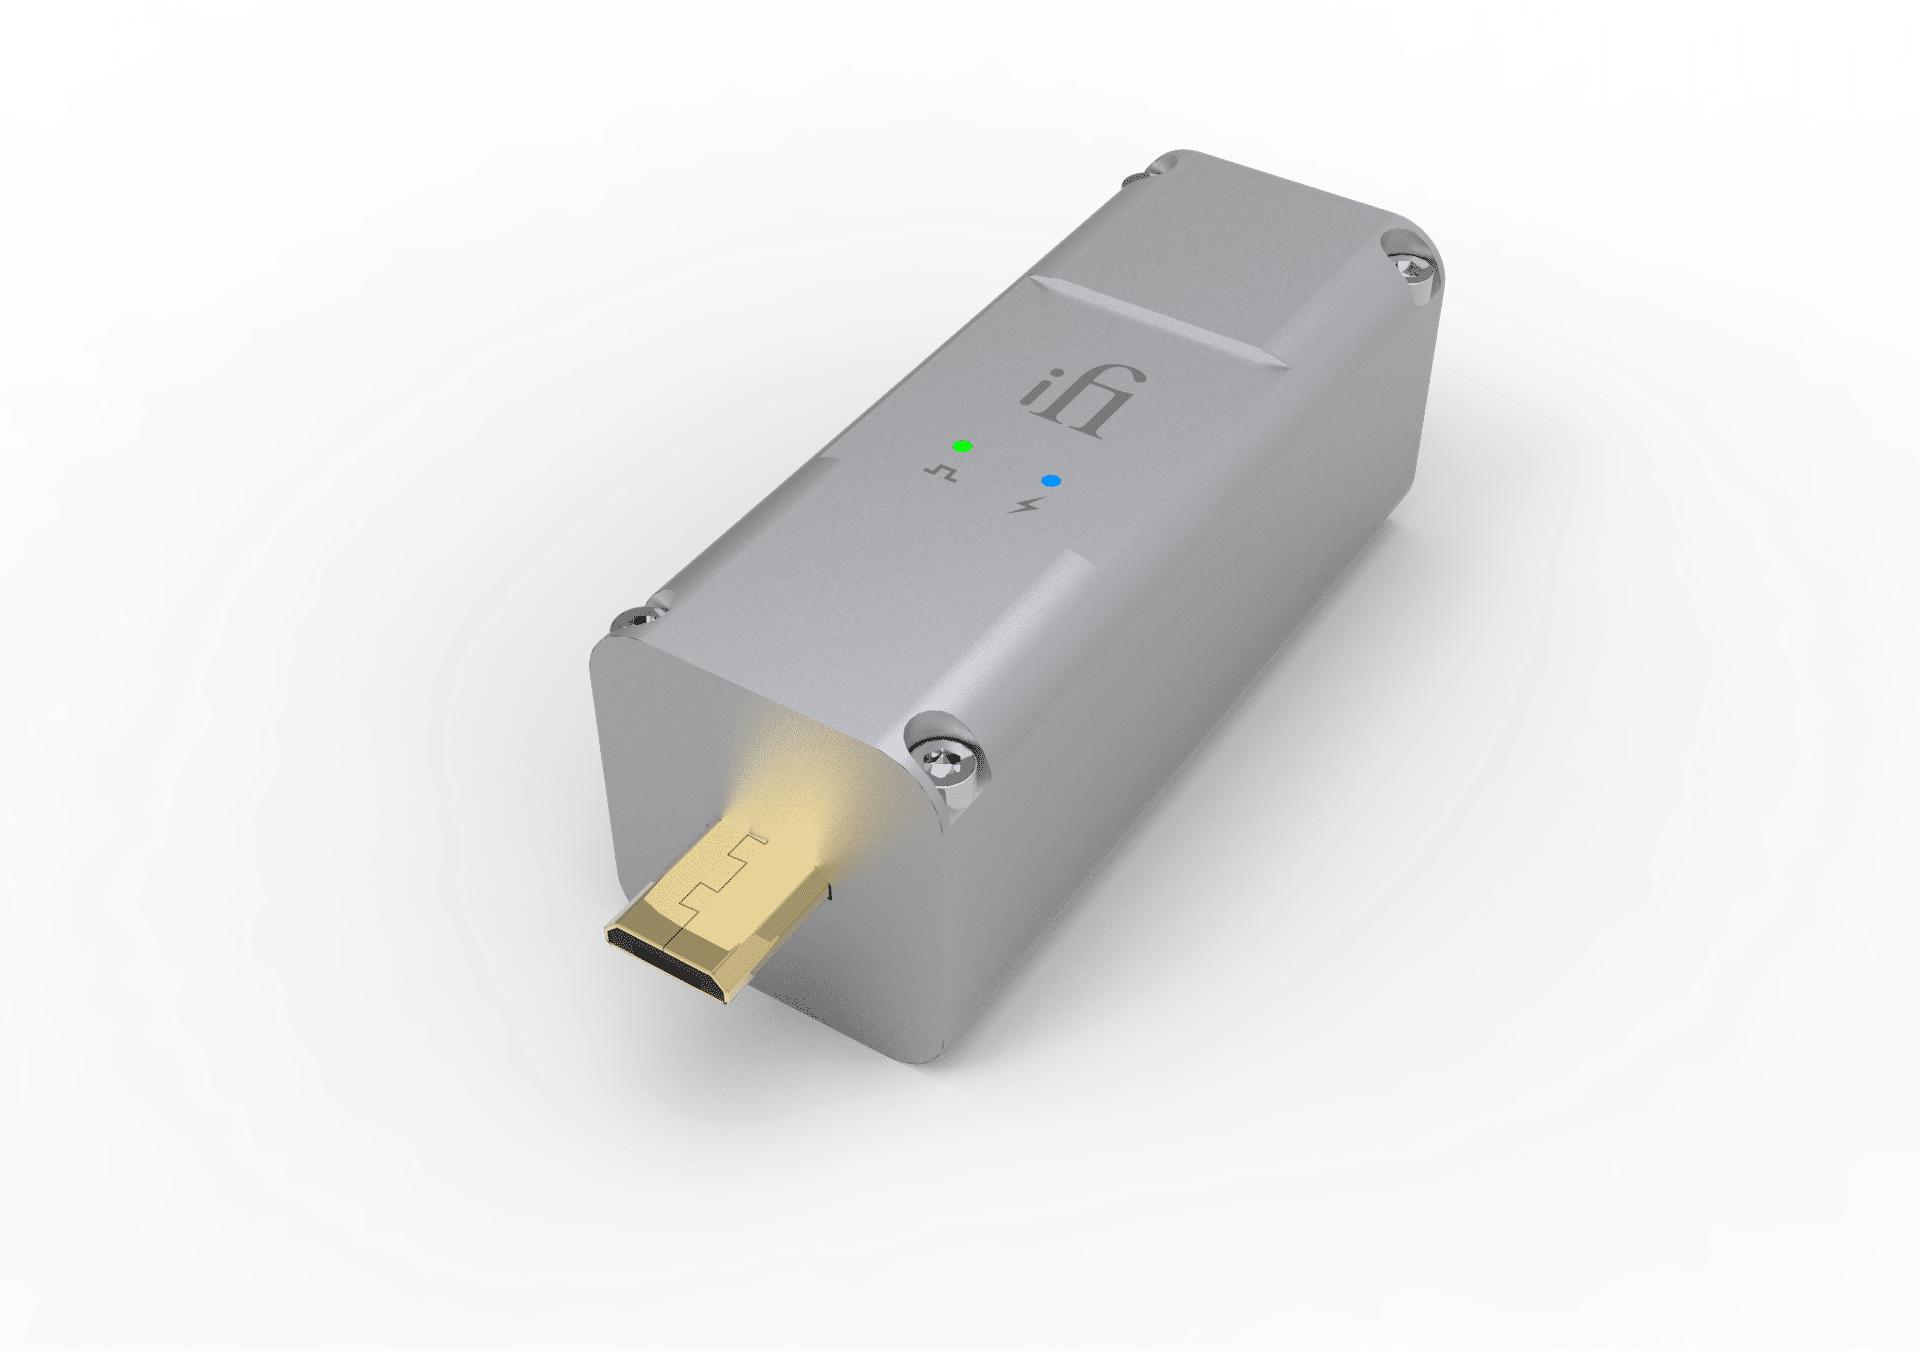 ipurifier-2_micro-usb